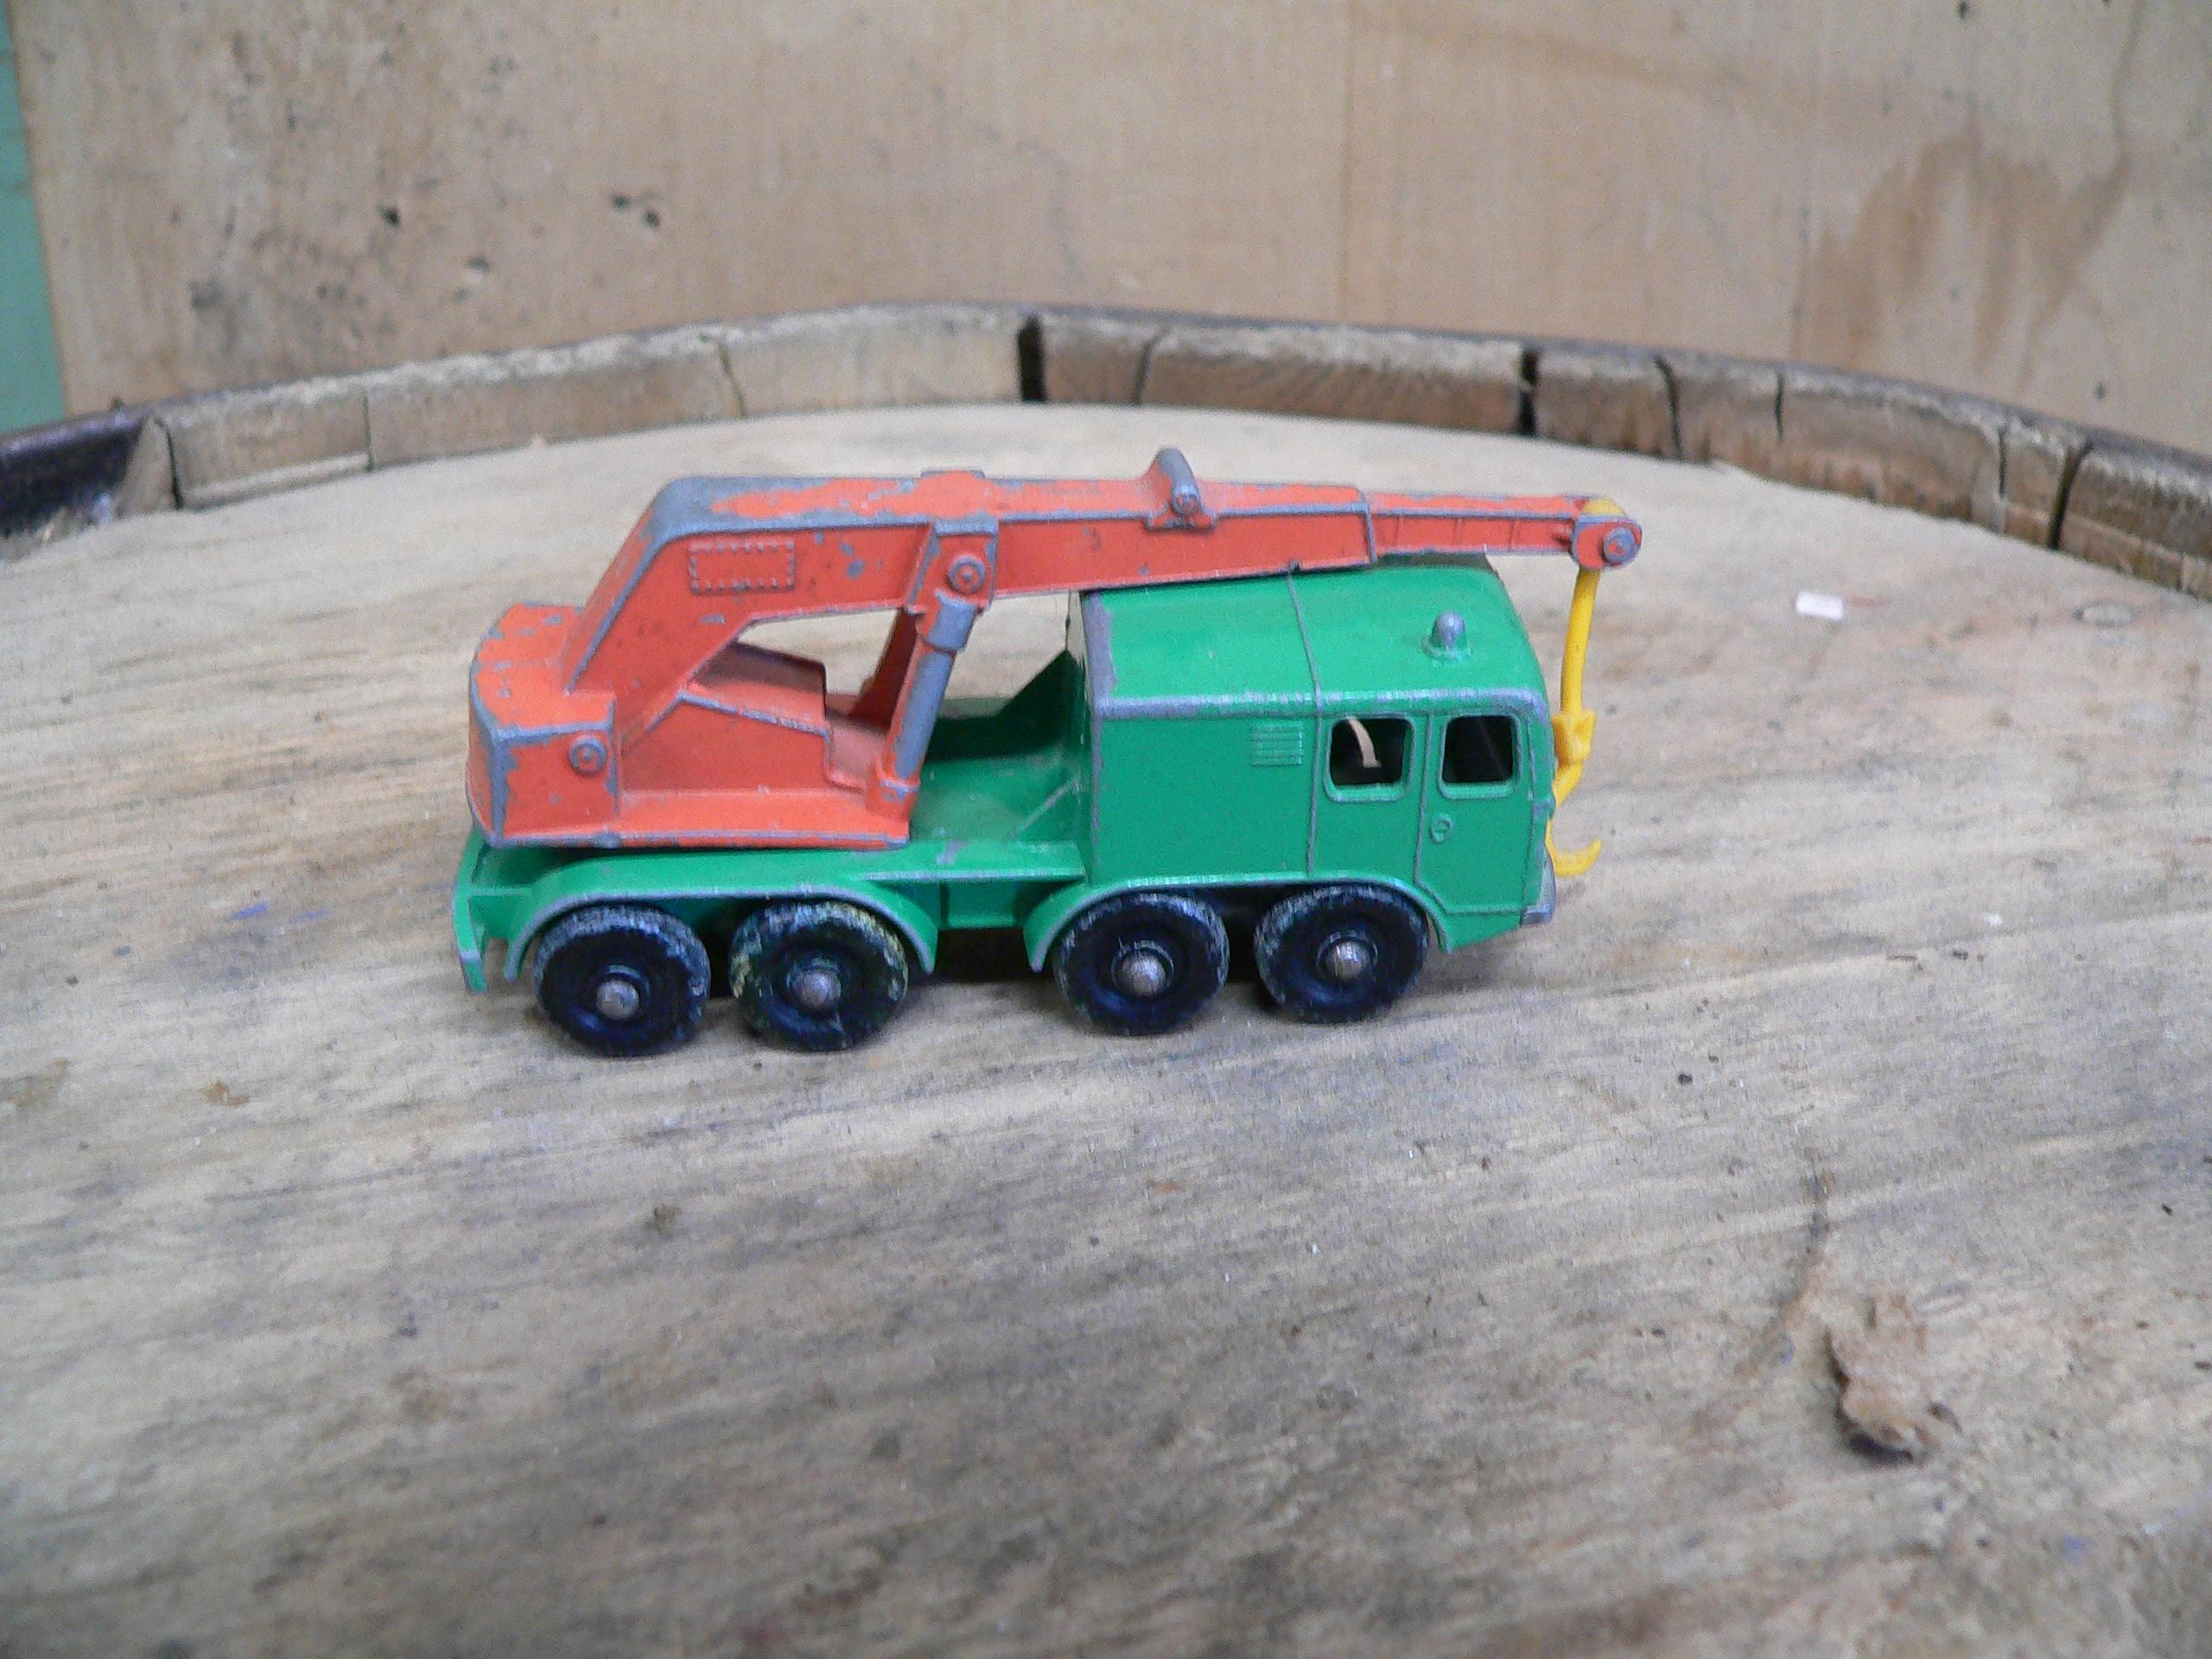 8-wheel crane truck # 5374.14